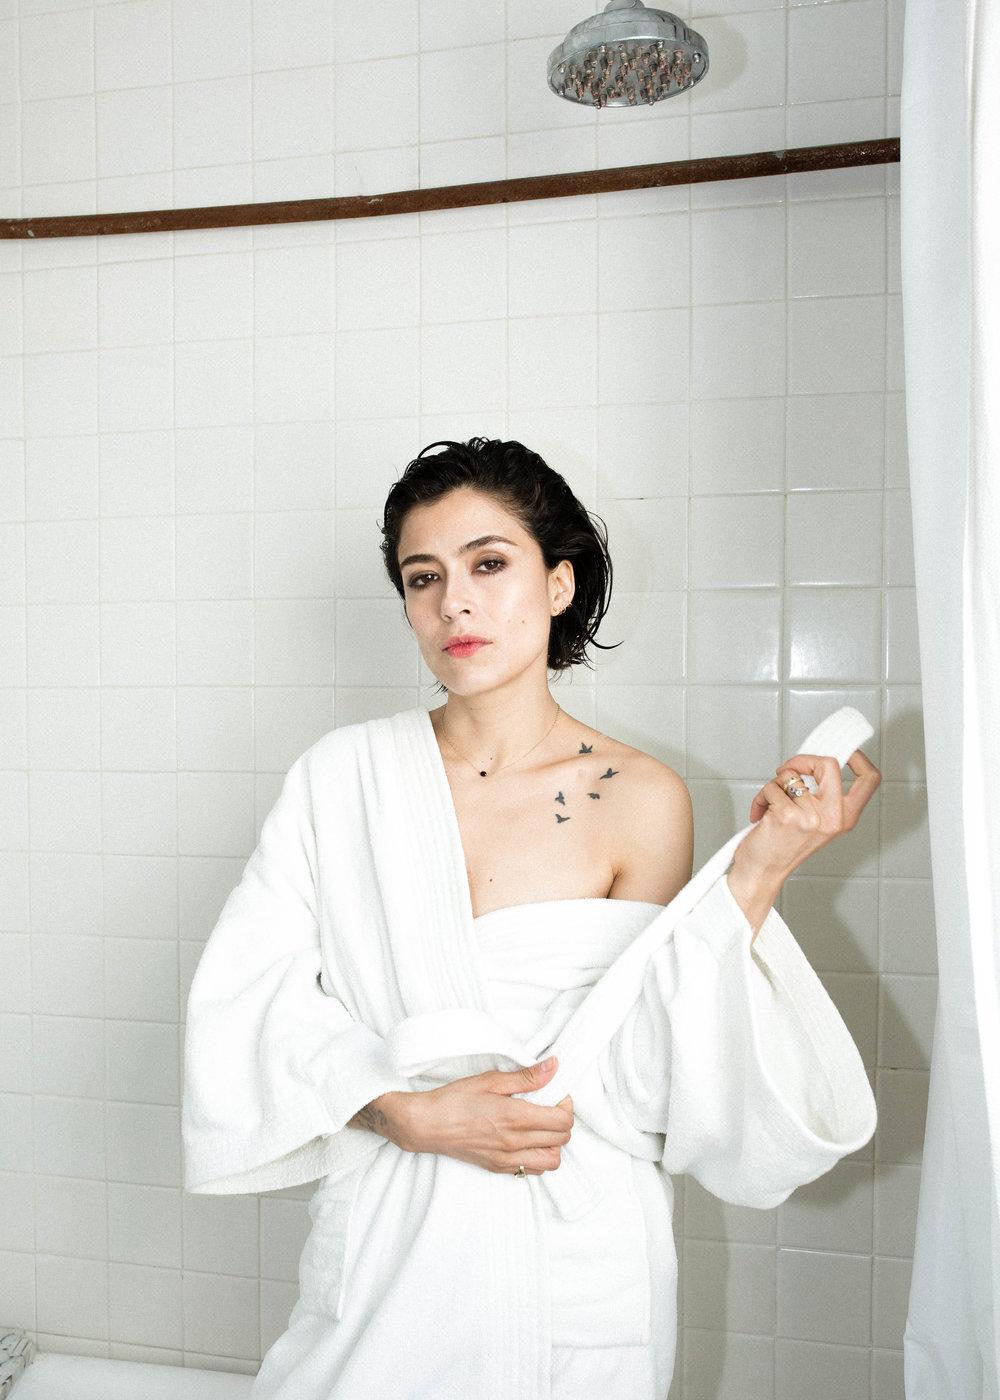 Sosa_Maguis-bathtub2.jpg